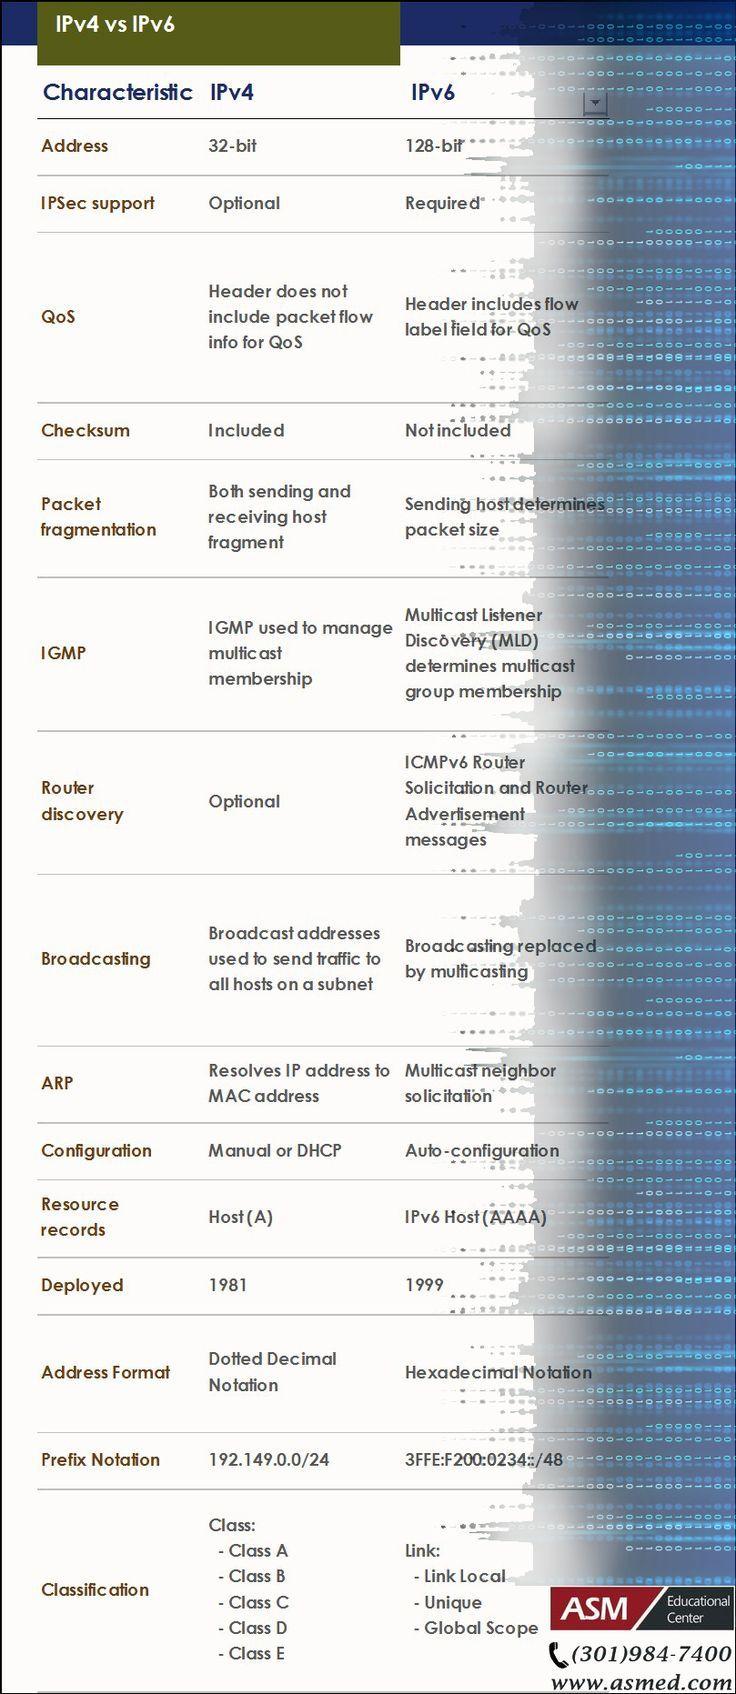 Cisco ccna training tip ipv4 vs ipv6r more information to cisco ccna training tip ipv4 vs ipv6r more information to get certified xflitez Gallery